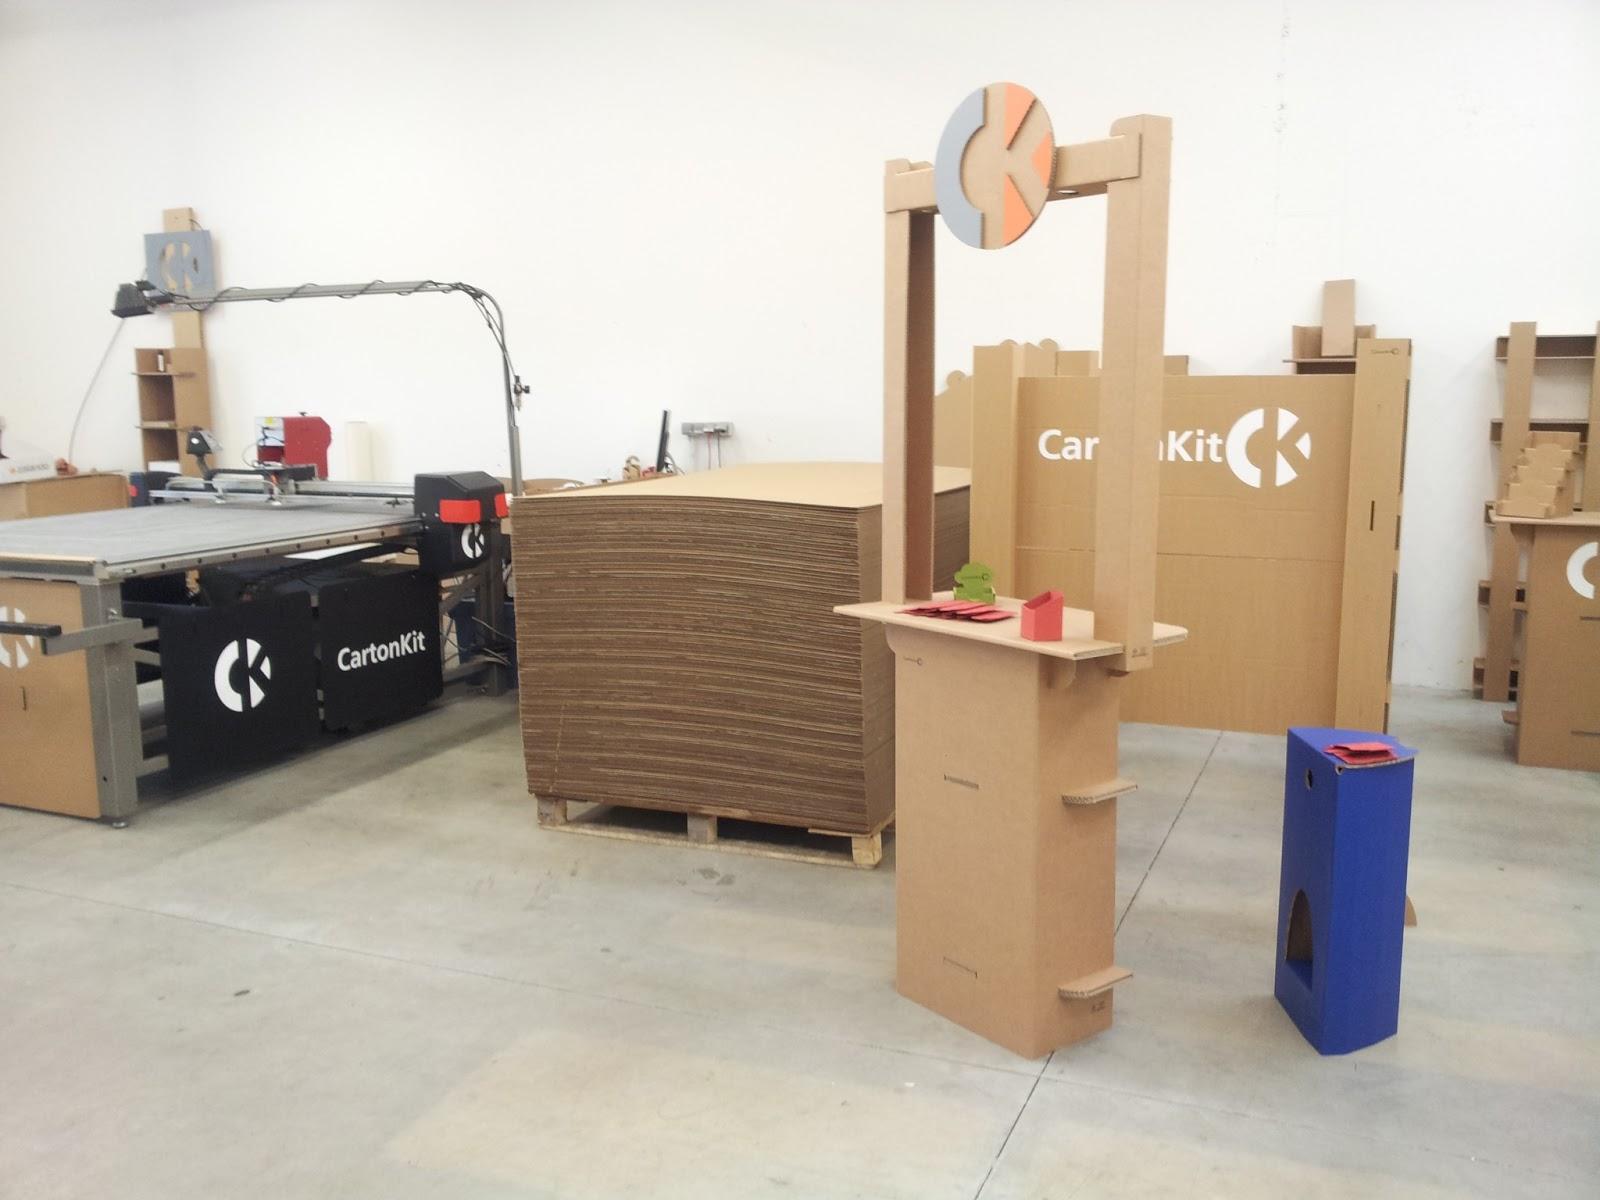 Carton kit cr ations objets et meubles 100 carton accueil - Meuble en carton prix ...